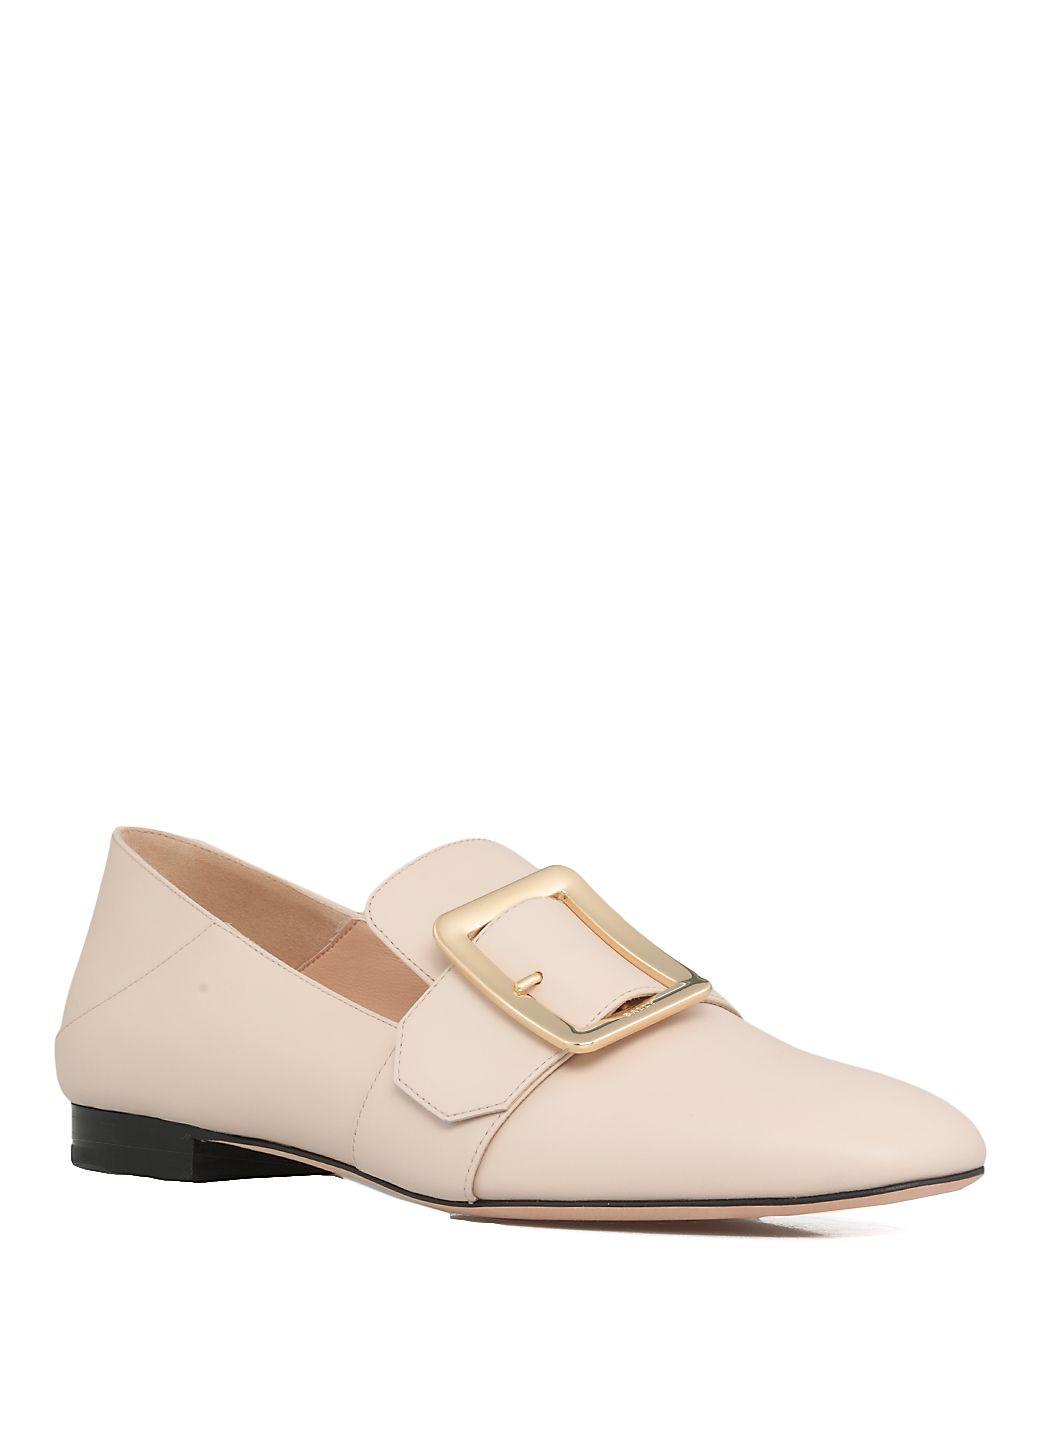 Janelle scarpa